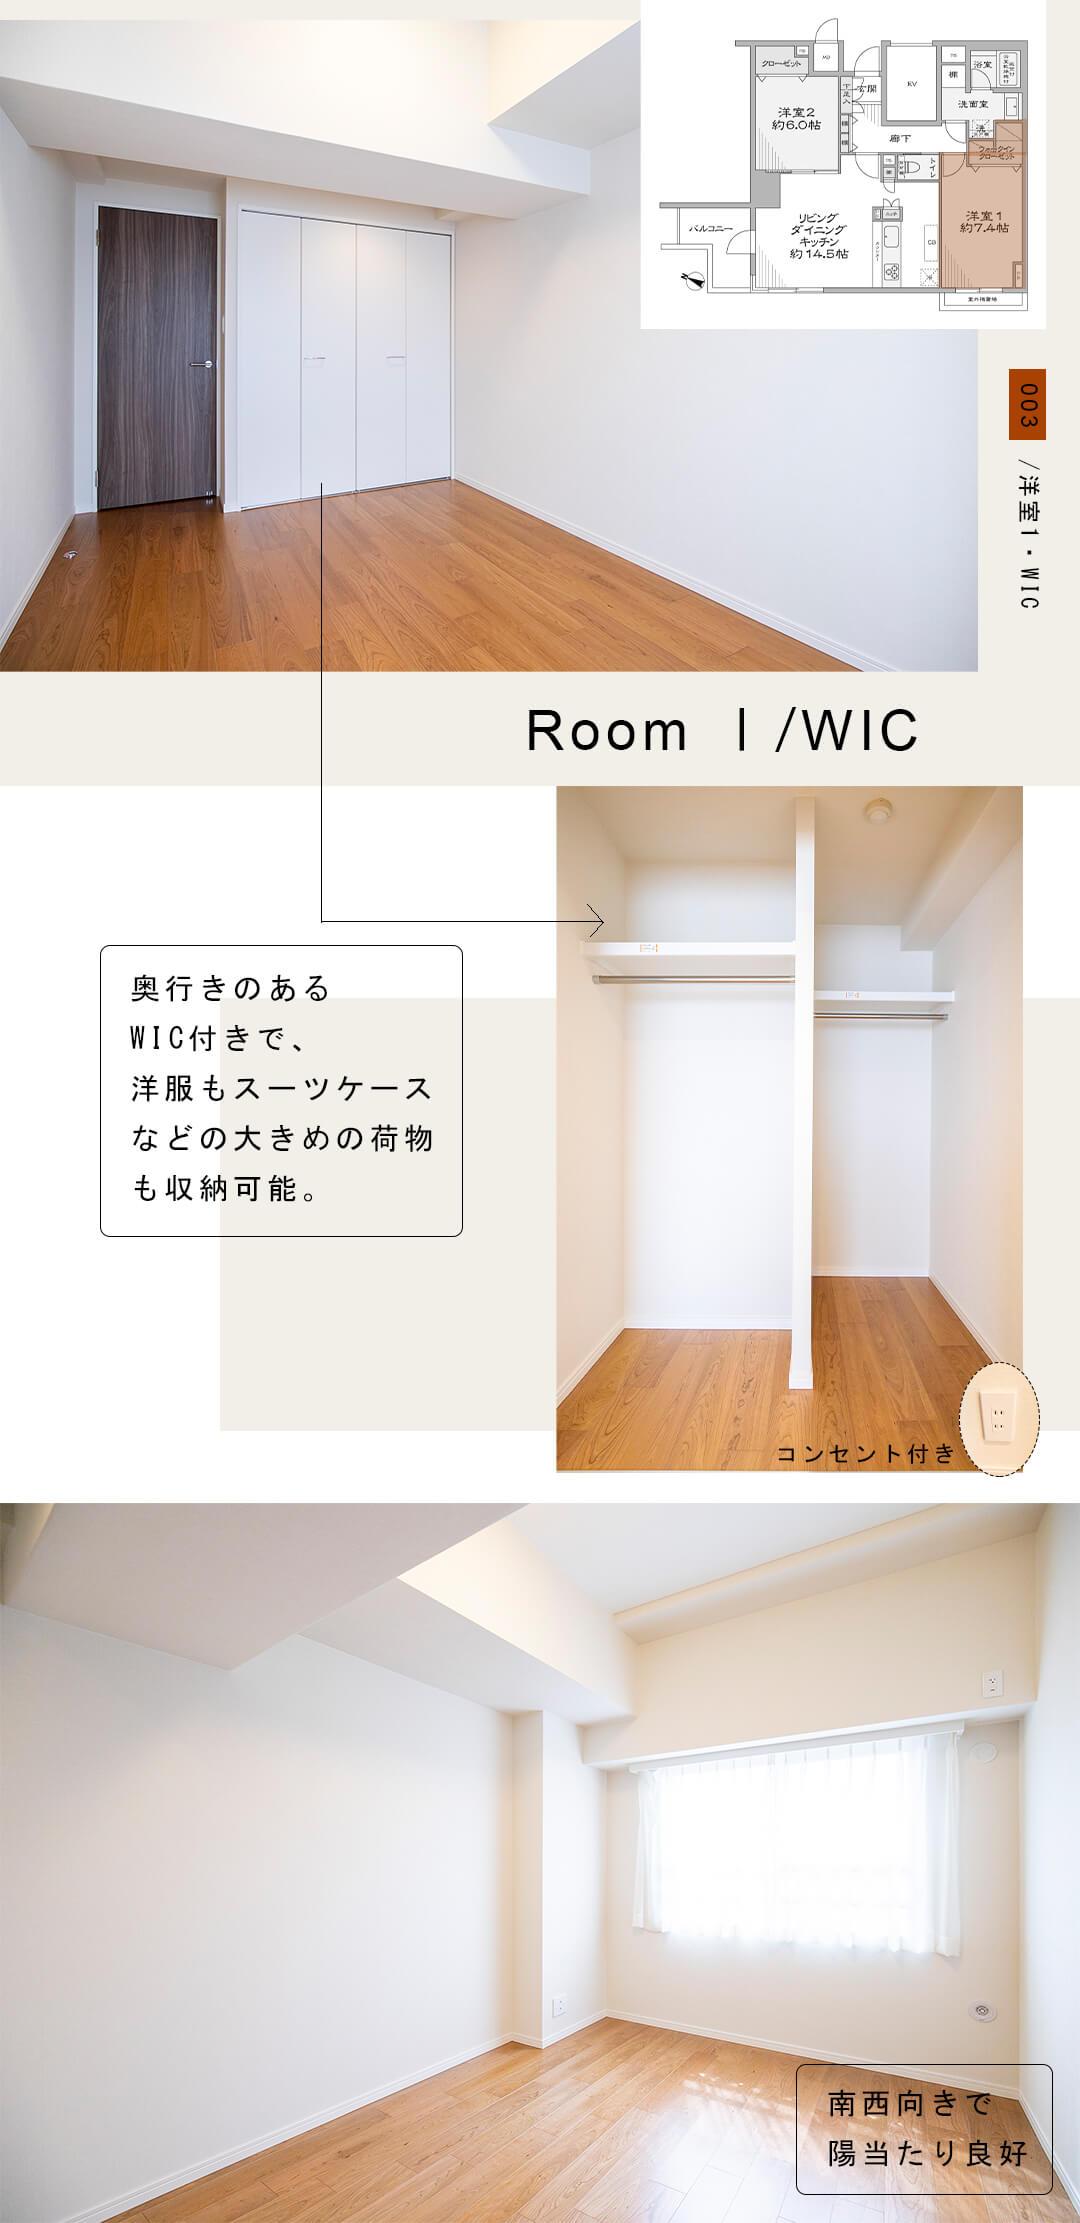 003洋室1,Room Ⅰ洋室,WIC